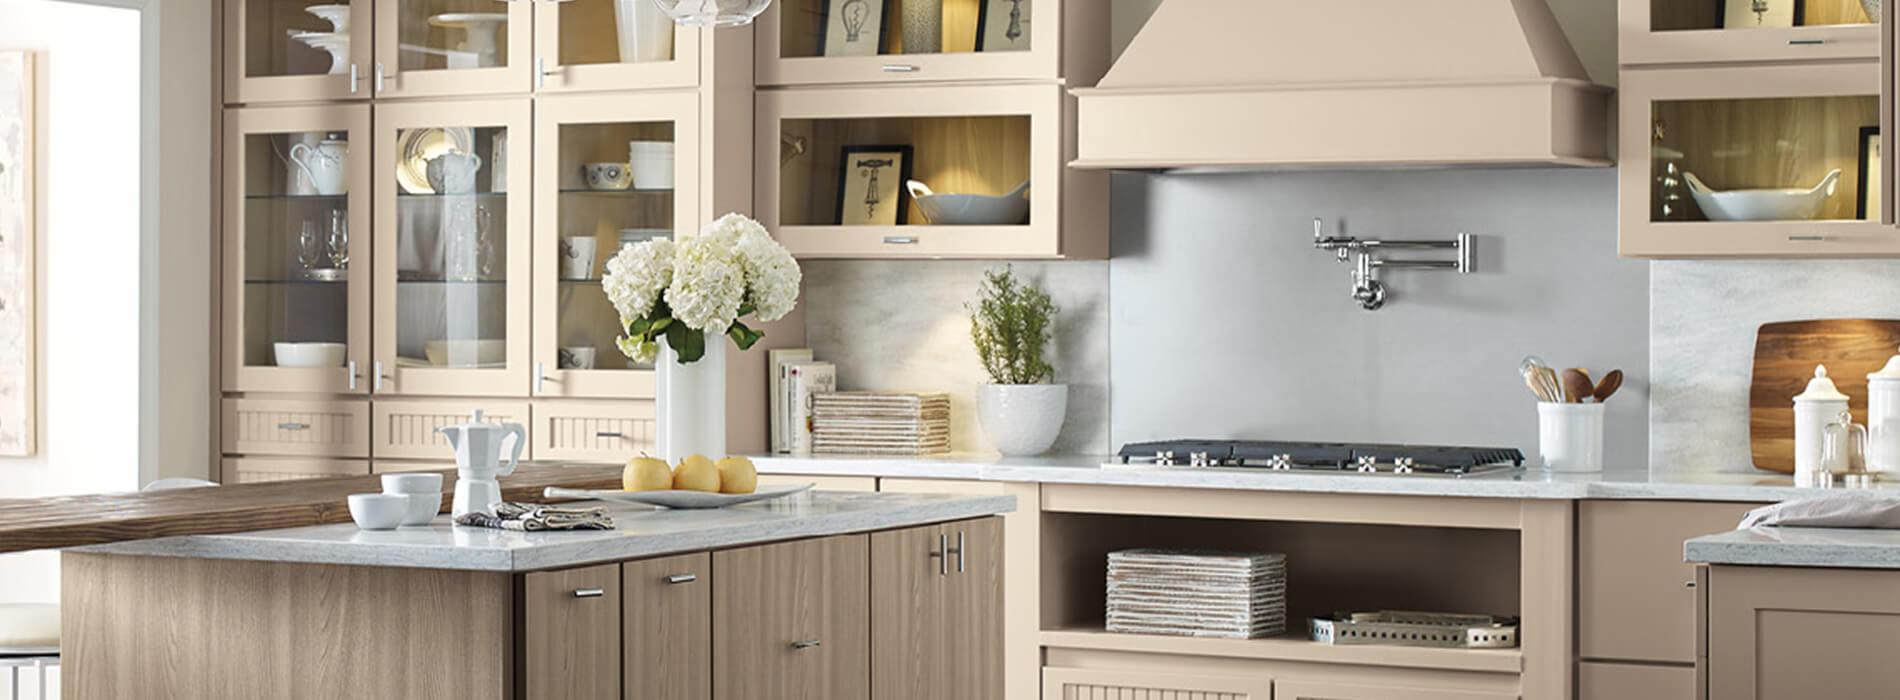 Kitchen & Bath Buying Guide, Chicago and Skokie IL